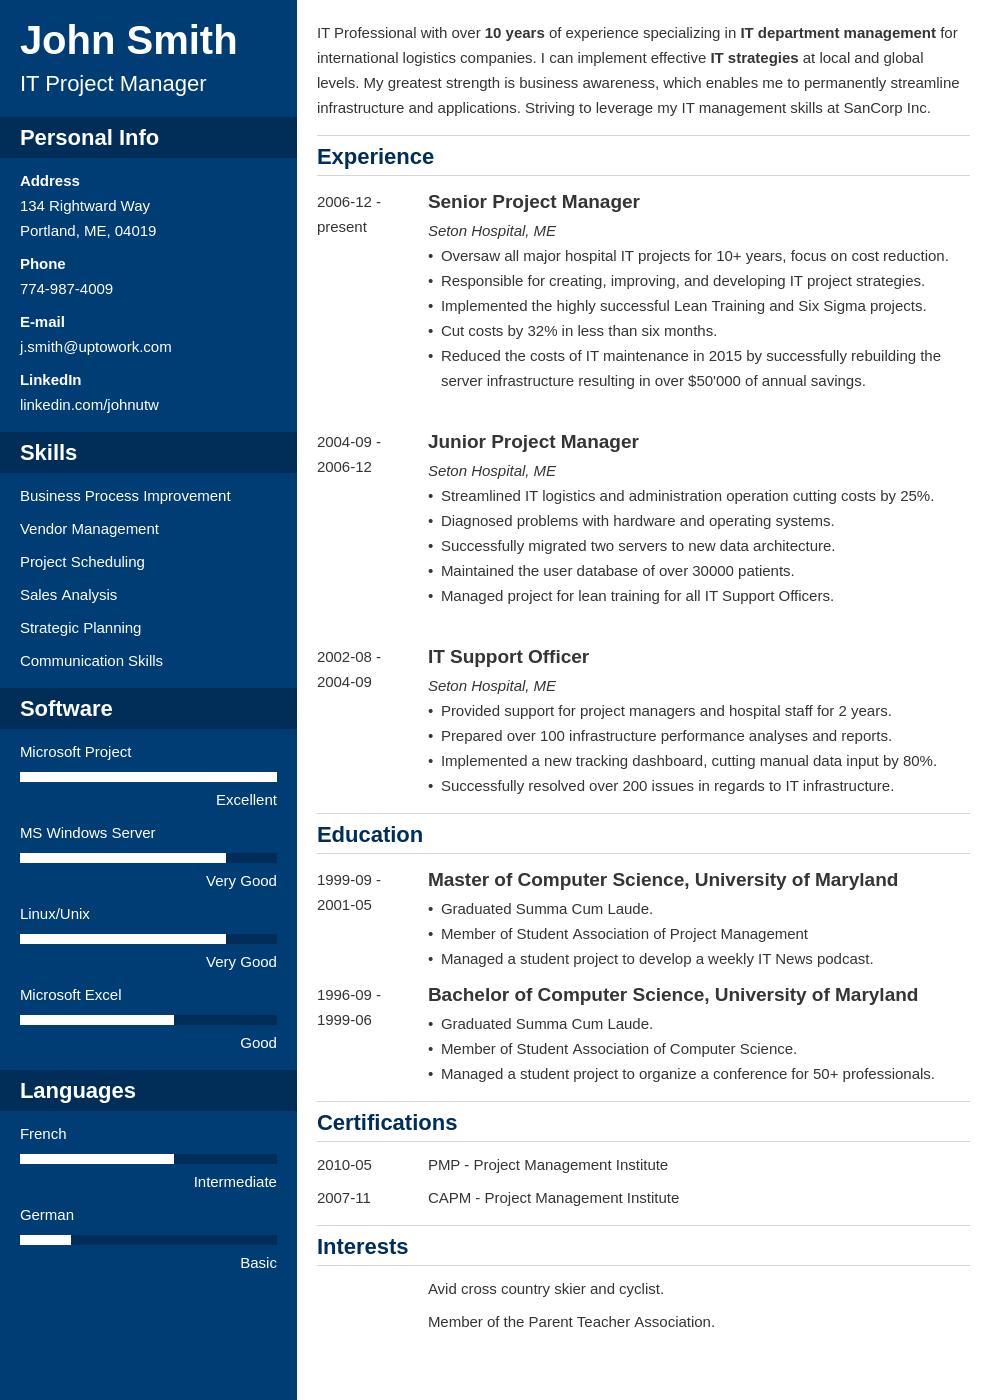 art direction internship job application cover letter